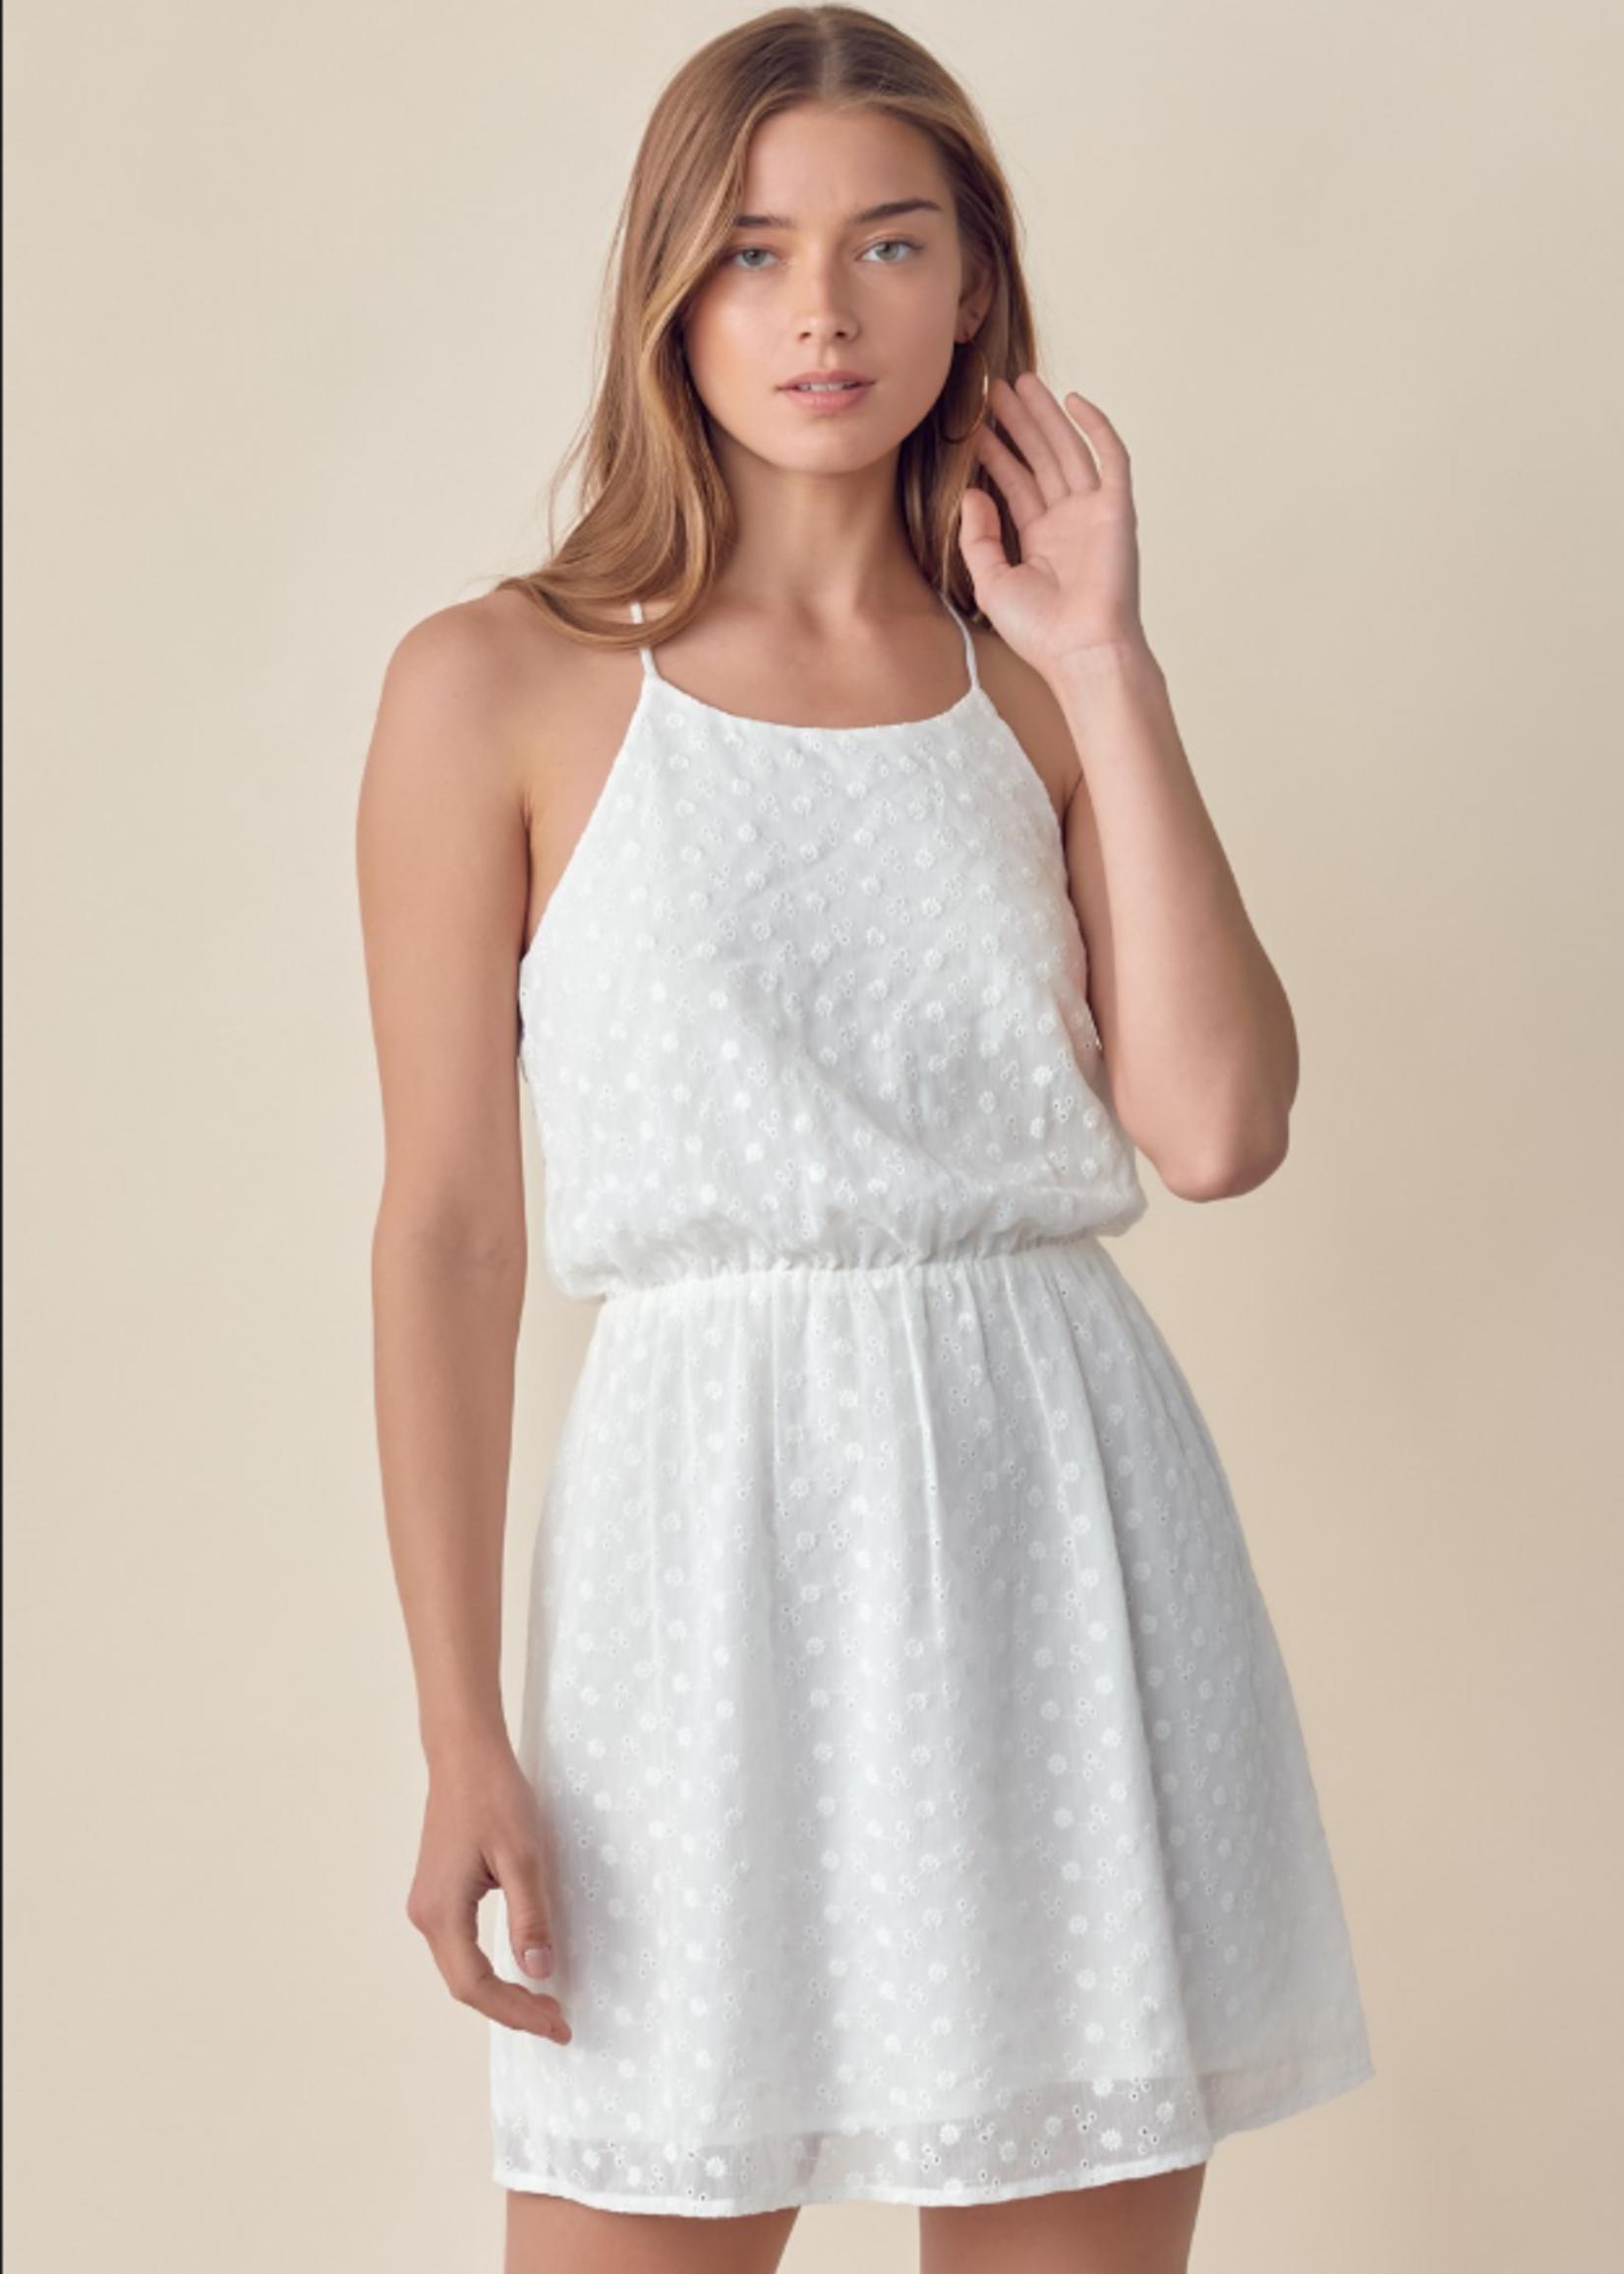 Eyelet Racerback Dress - White